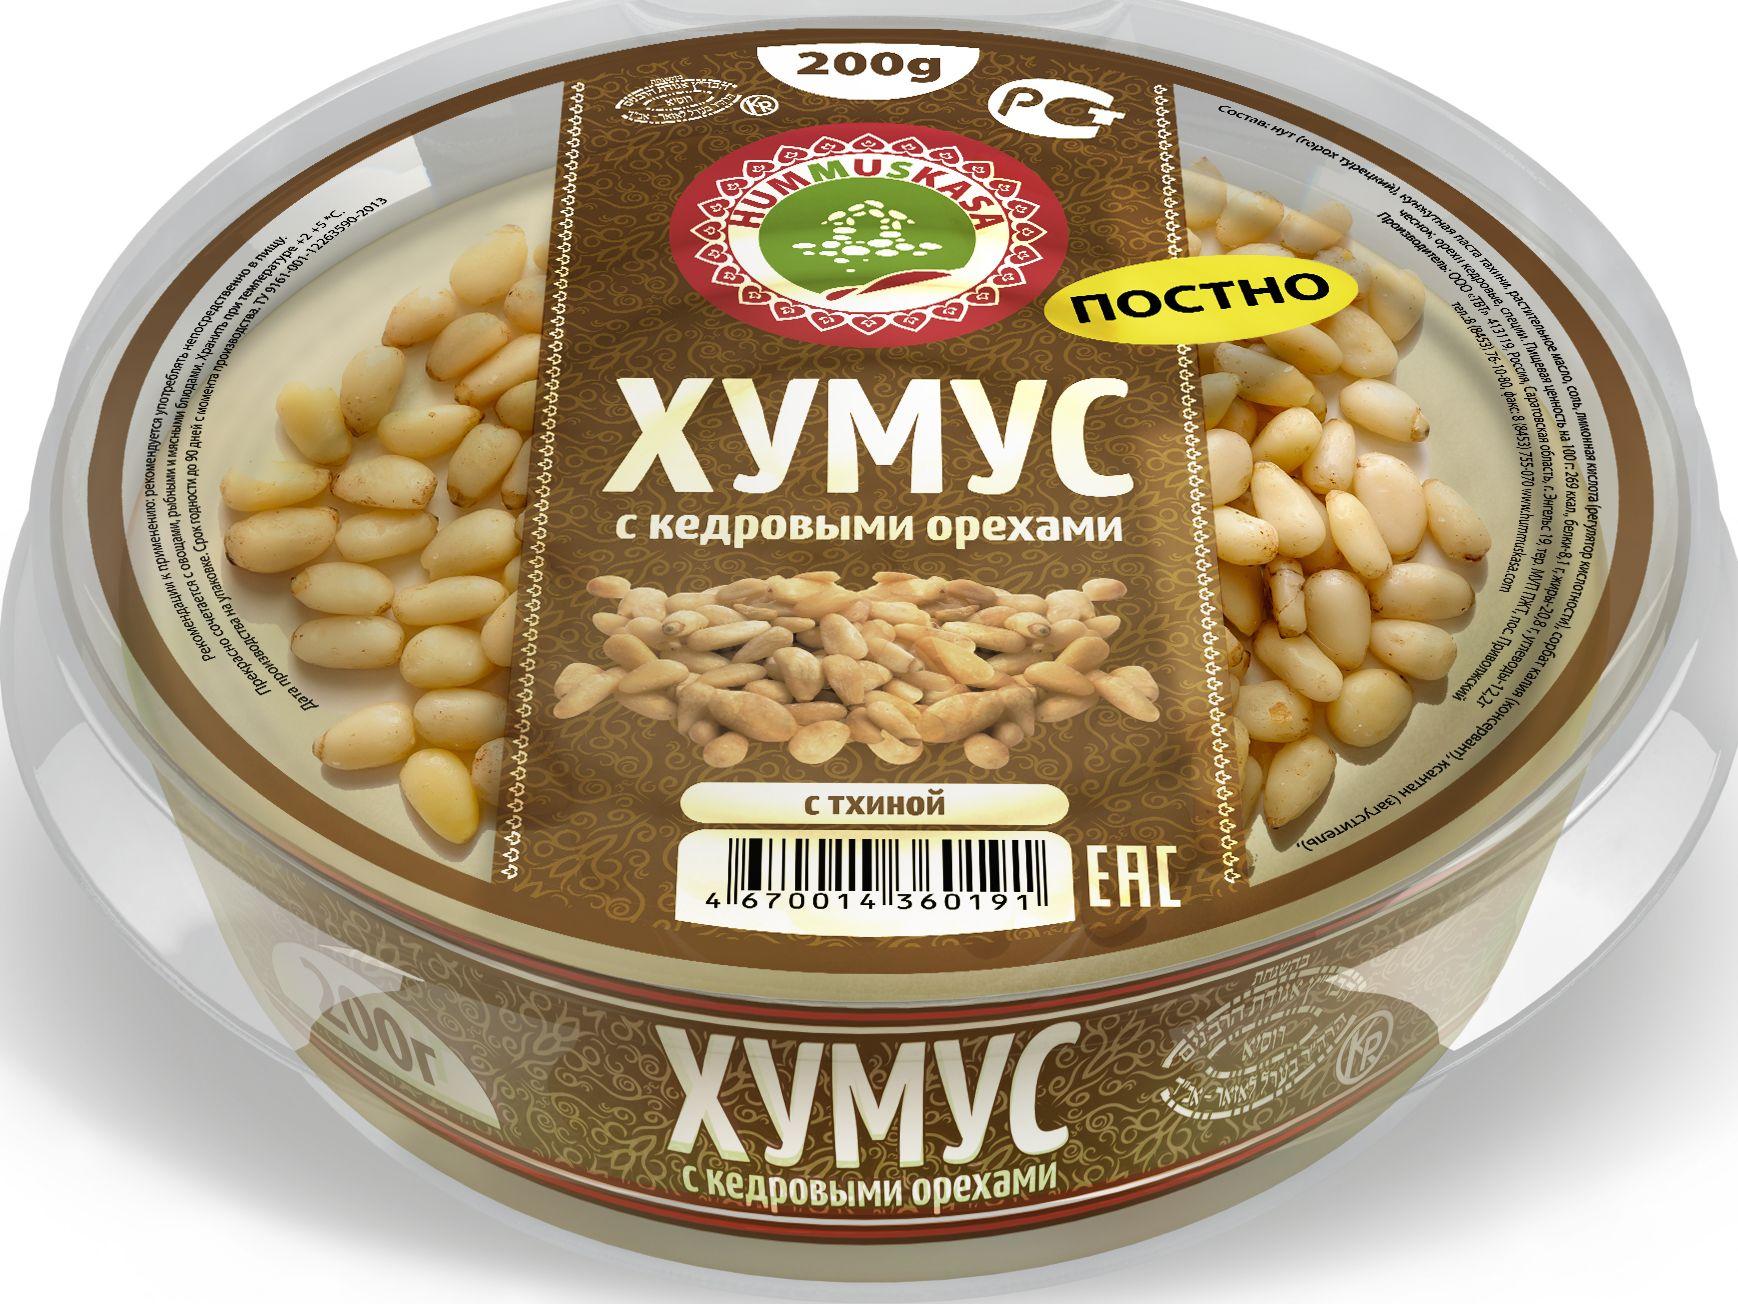 Hummuskasa Хумус с кедровыми орешками, 200 г